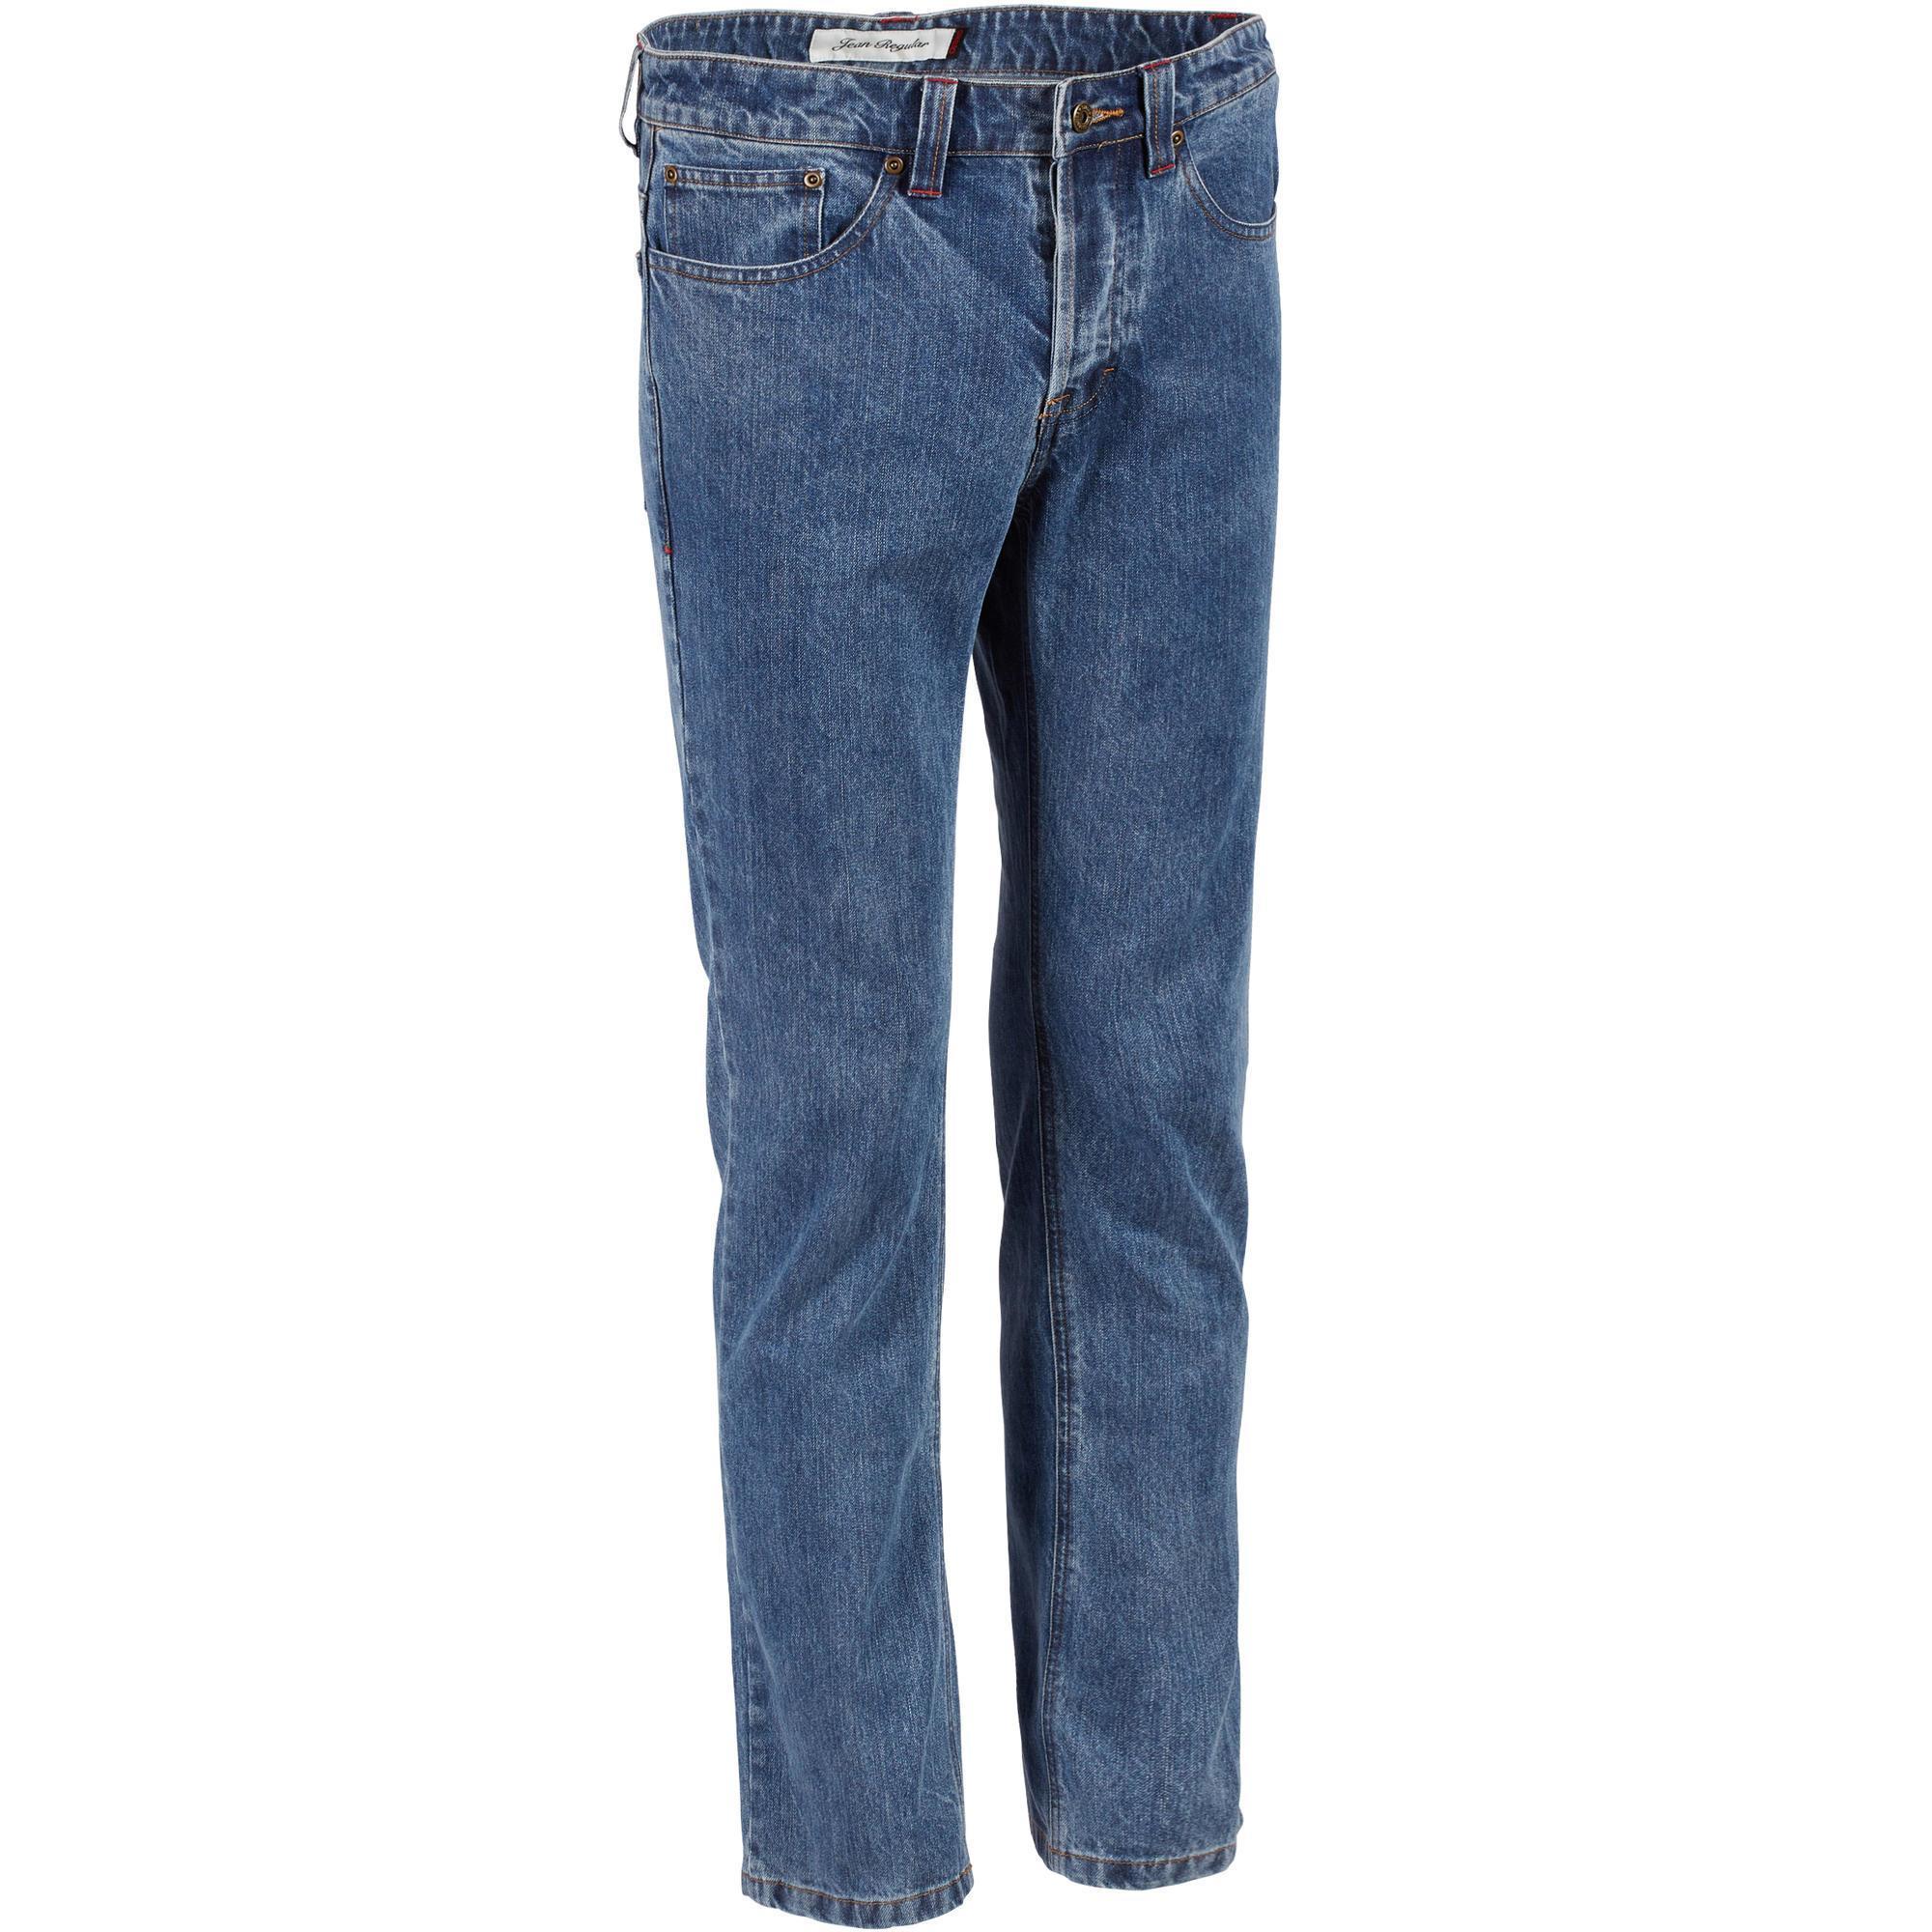 Oxelo Skate jeans Street voor heren